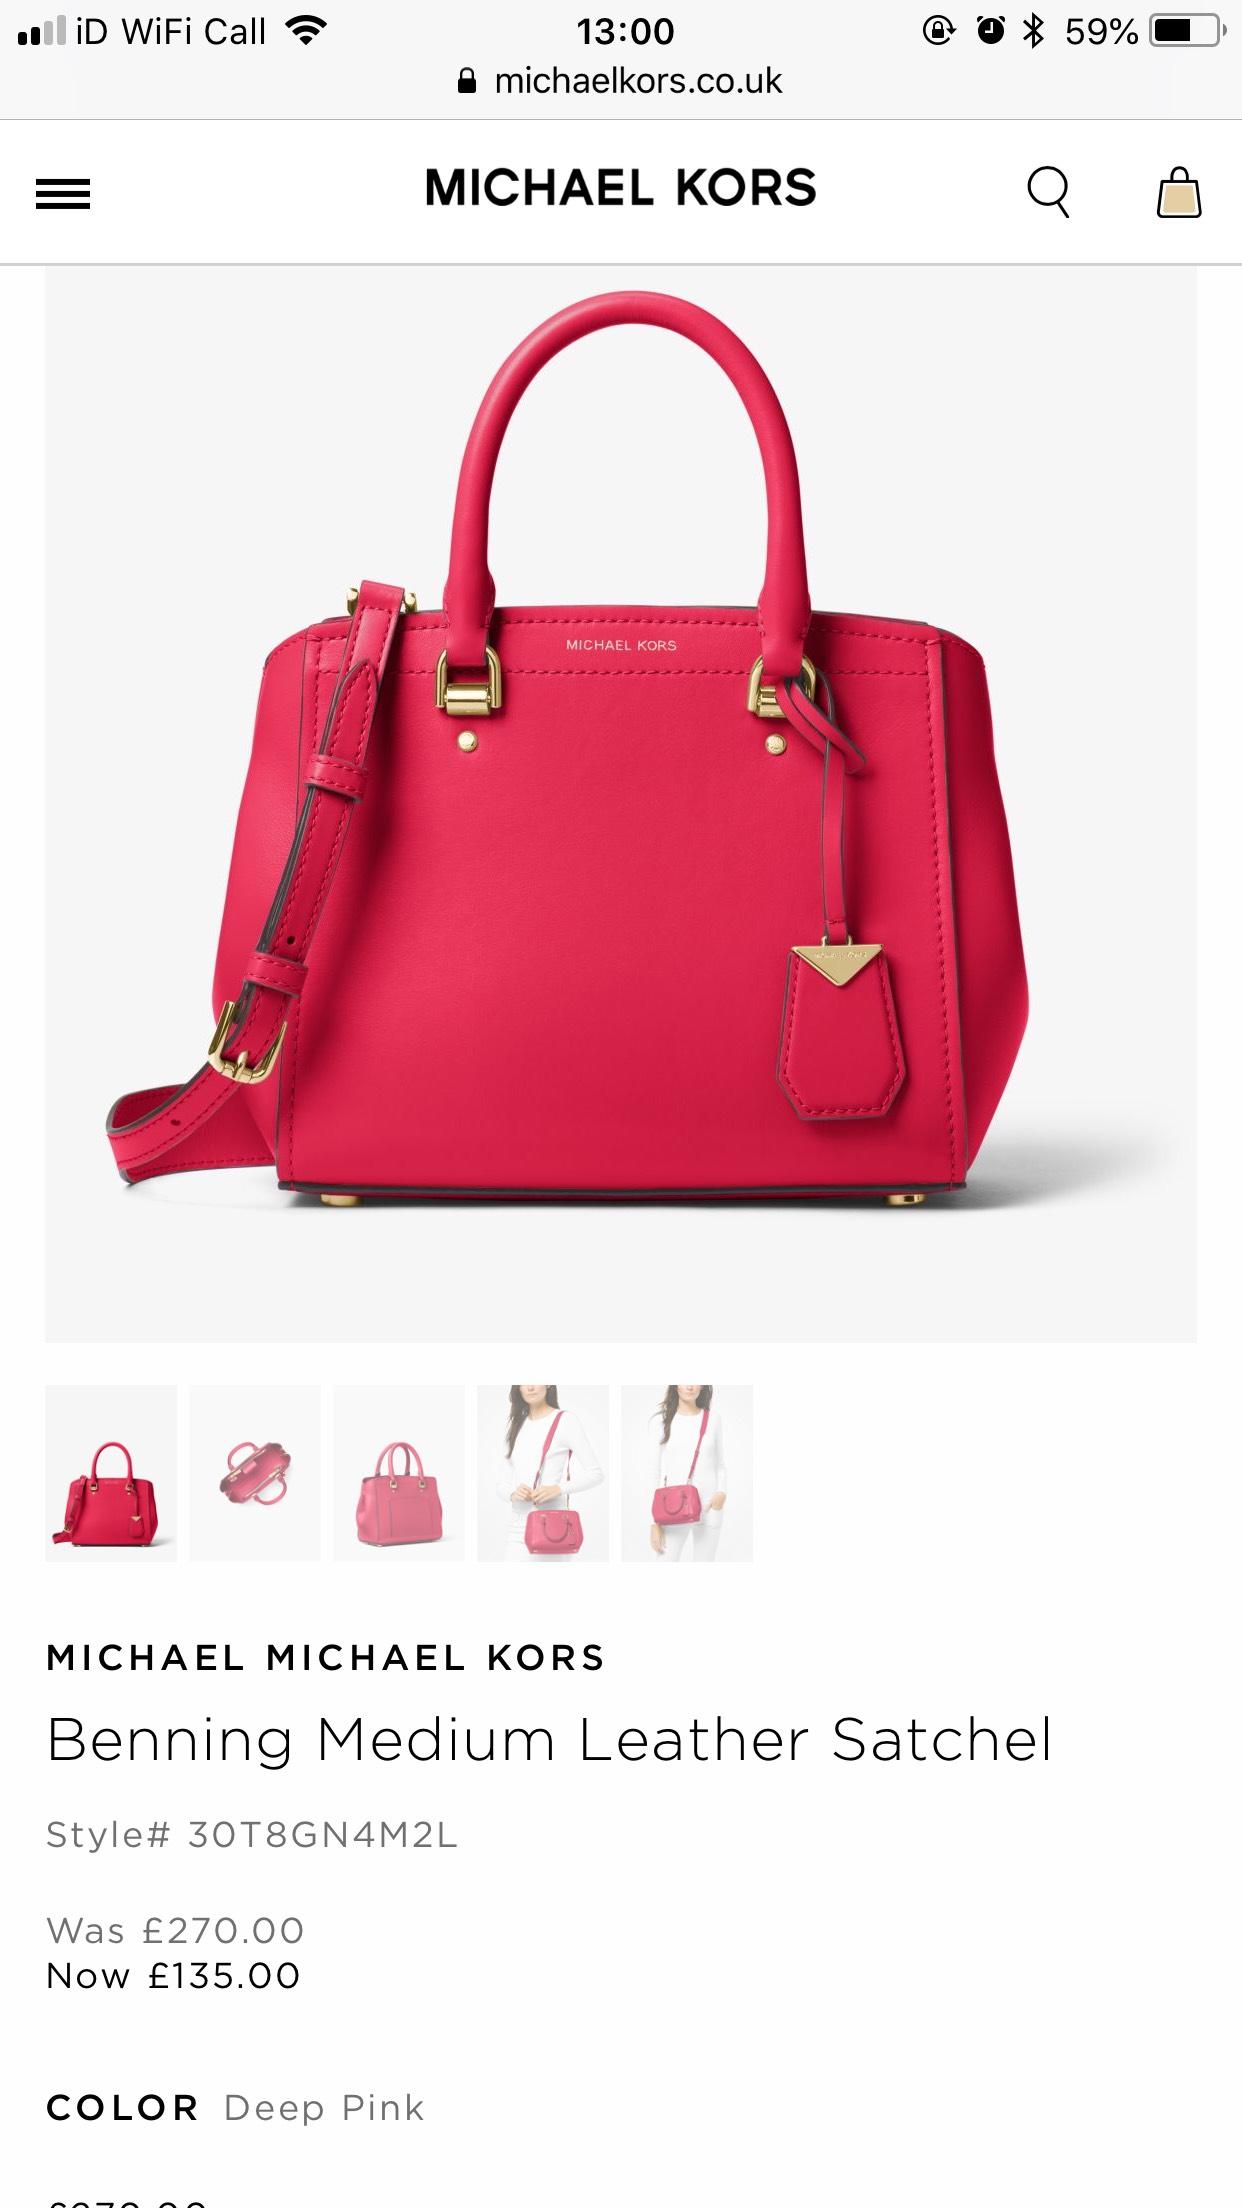 MICHAEL KORS Benning Medium Leather Satchel £135